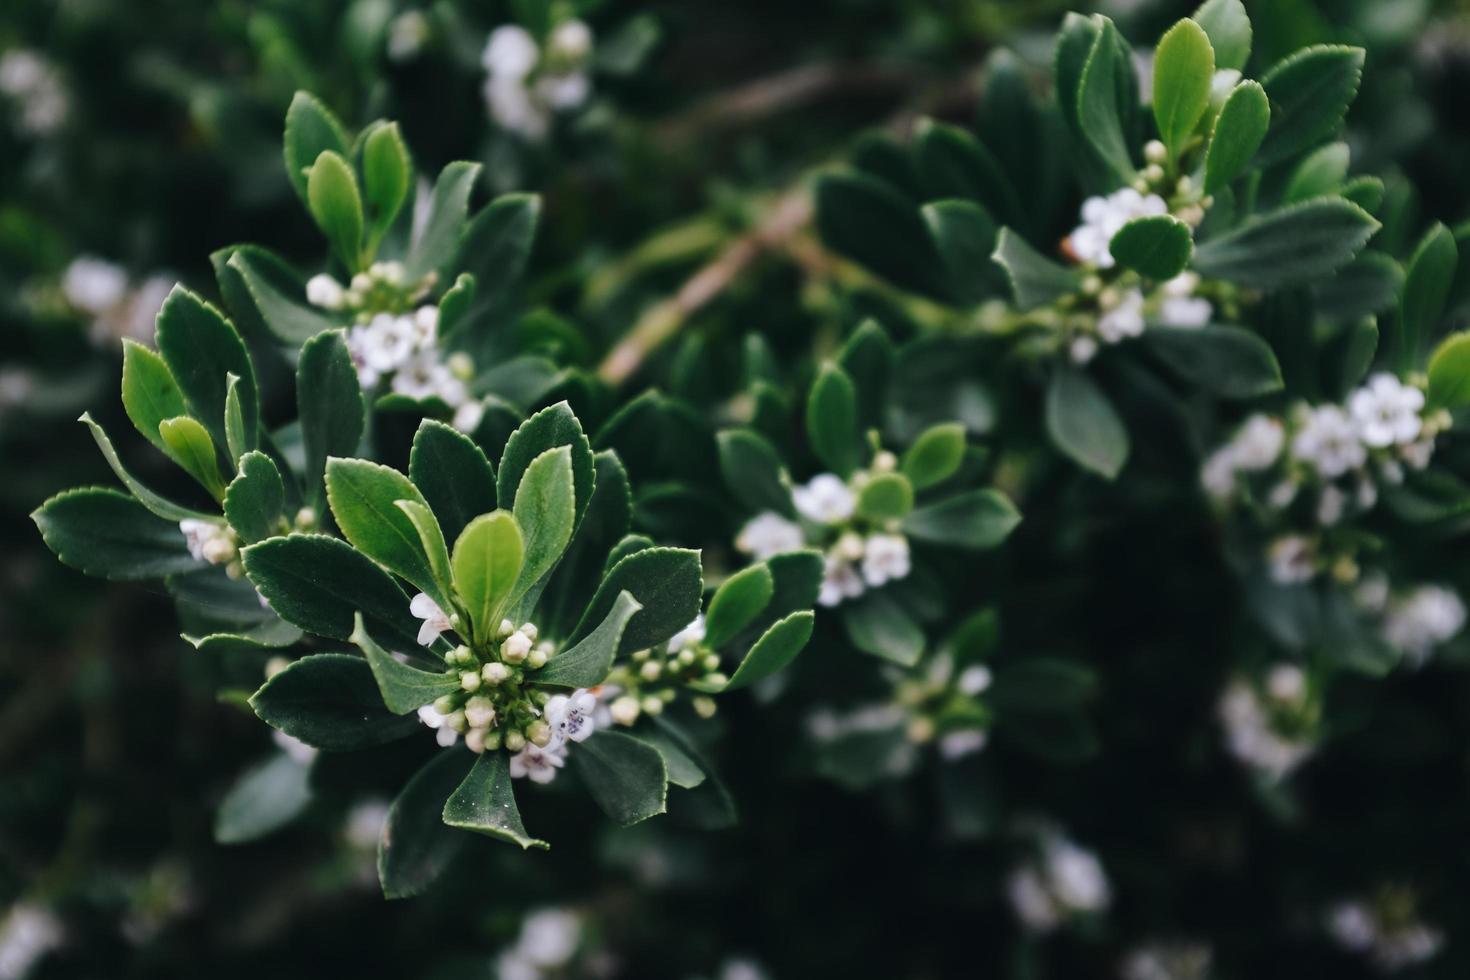 plante en grappe blanche photo